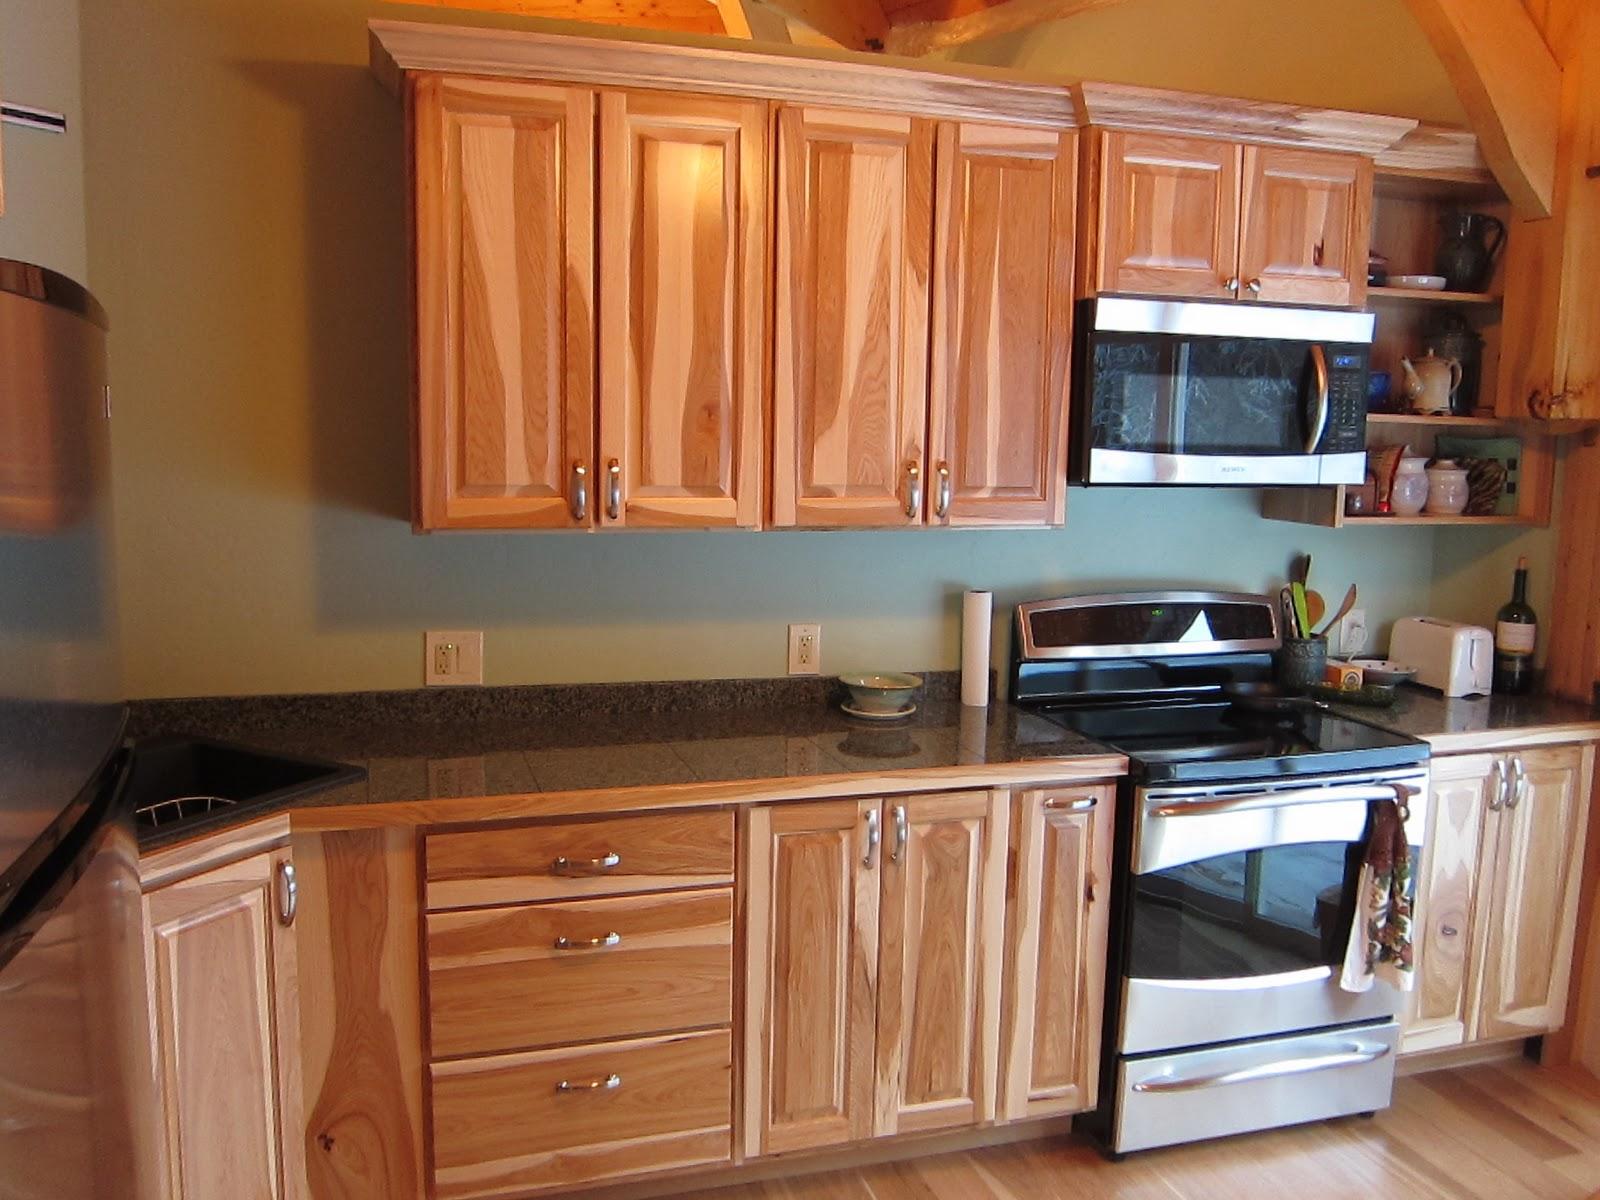 Hickory Kitchen Cabinets Stone Backsplash For Stix 39s Woodworks